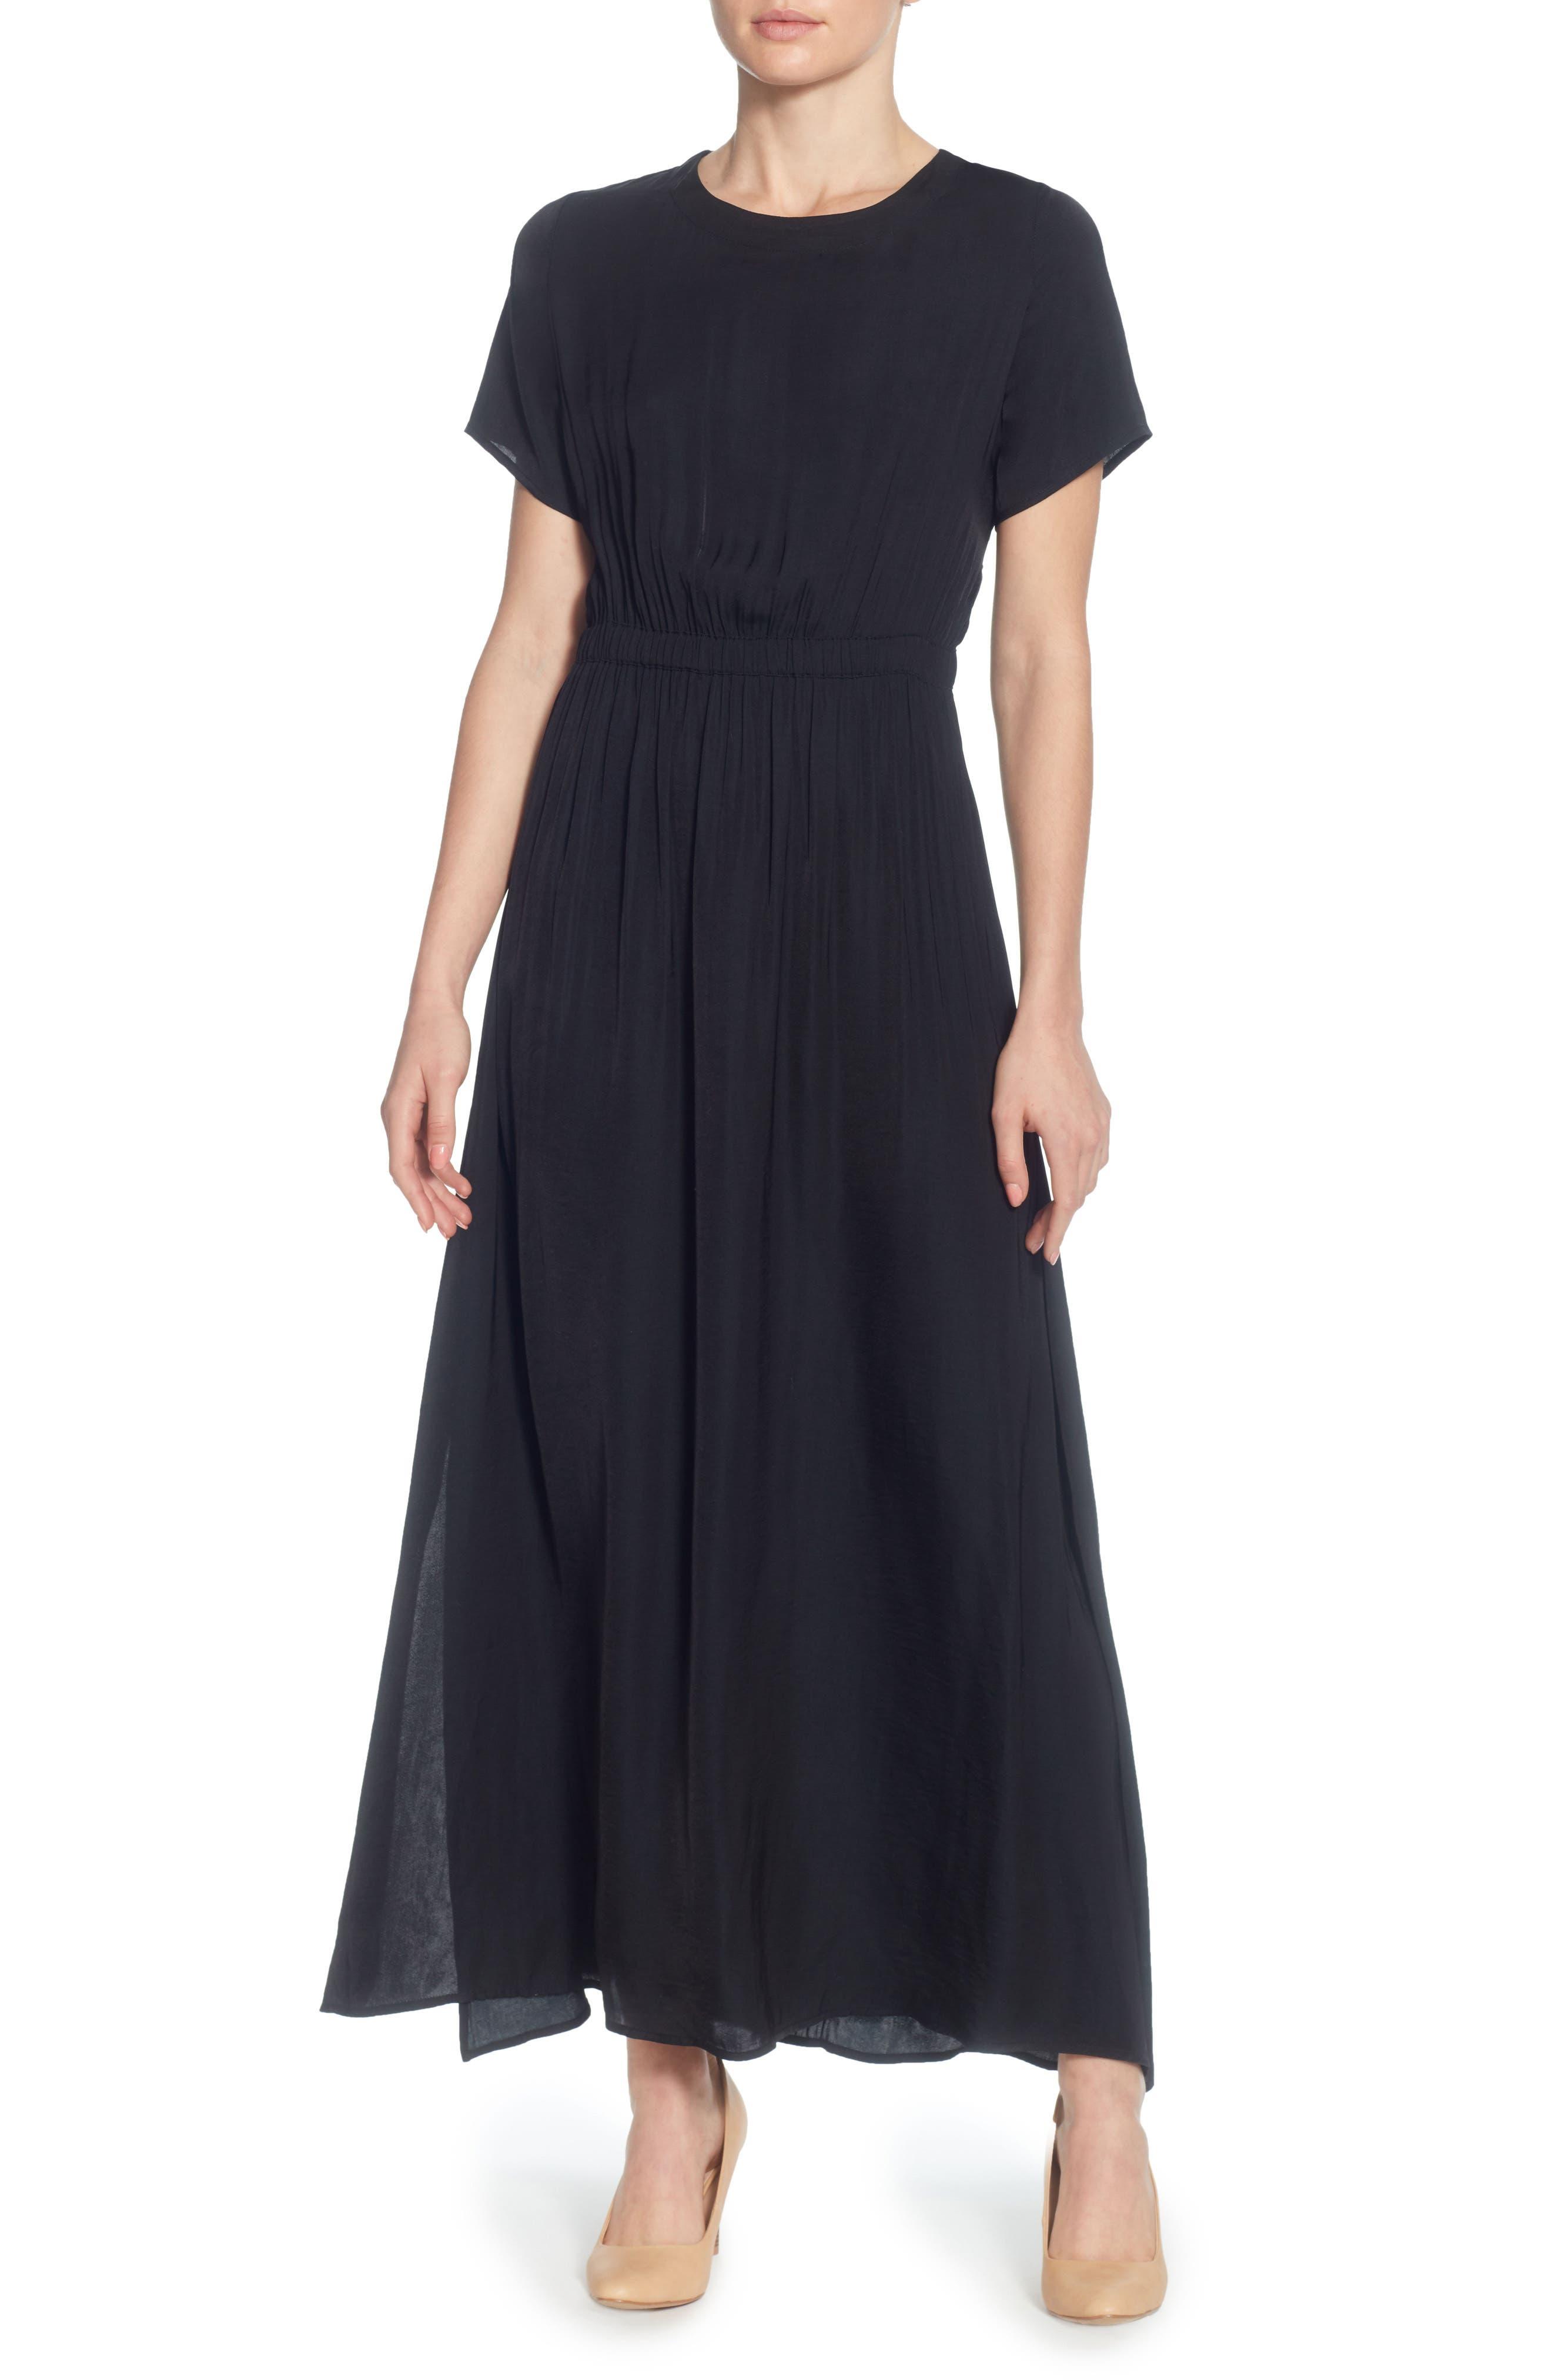 Lua Maxi Dress,                             Main thumbnail 1, color,                             Black